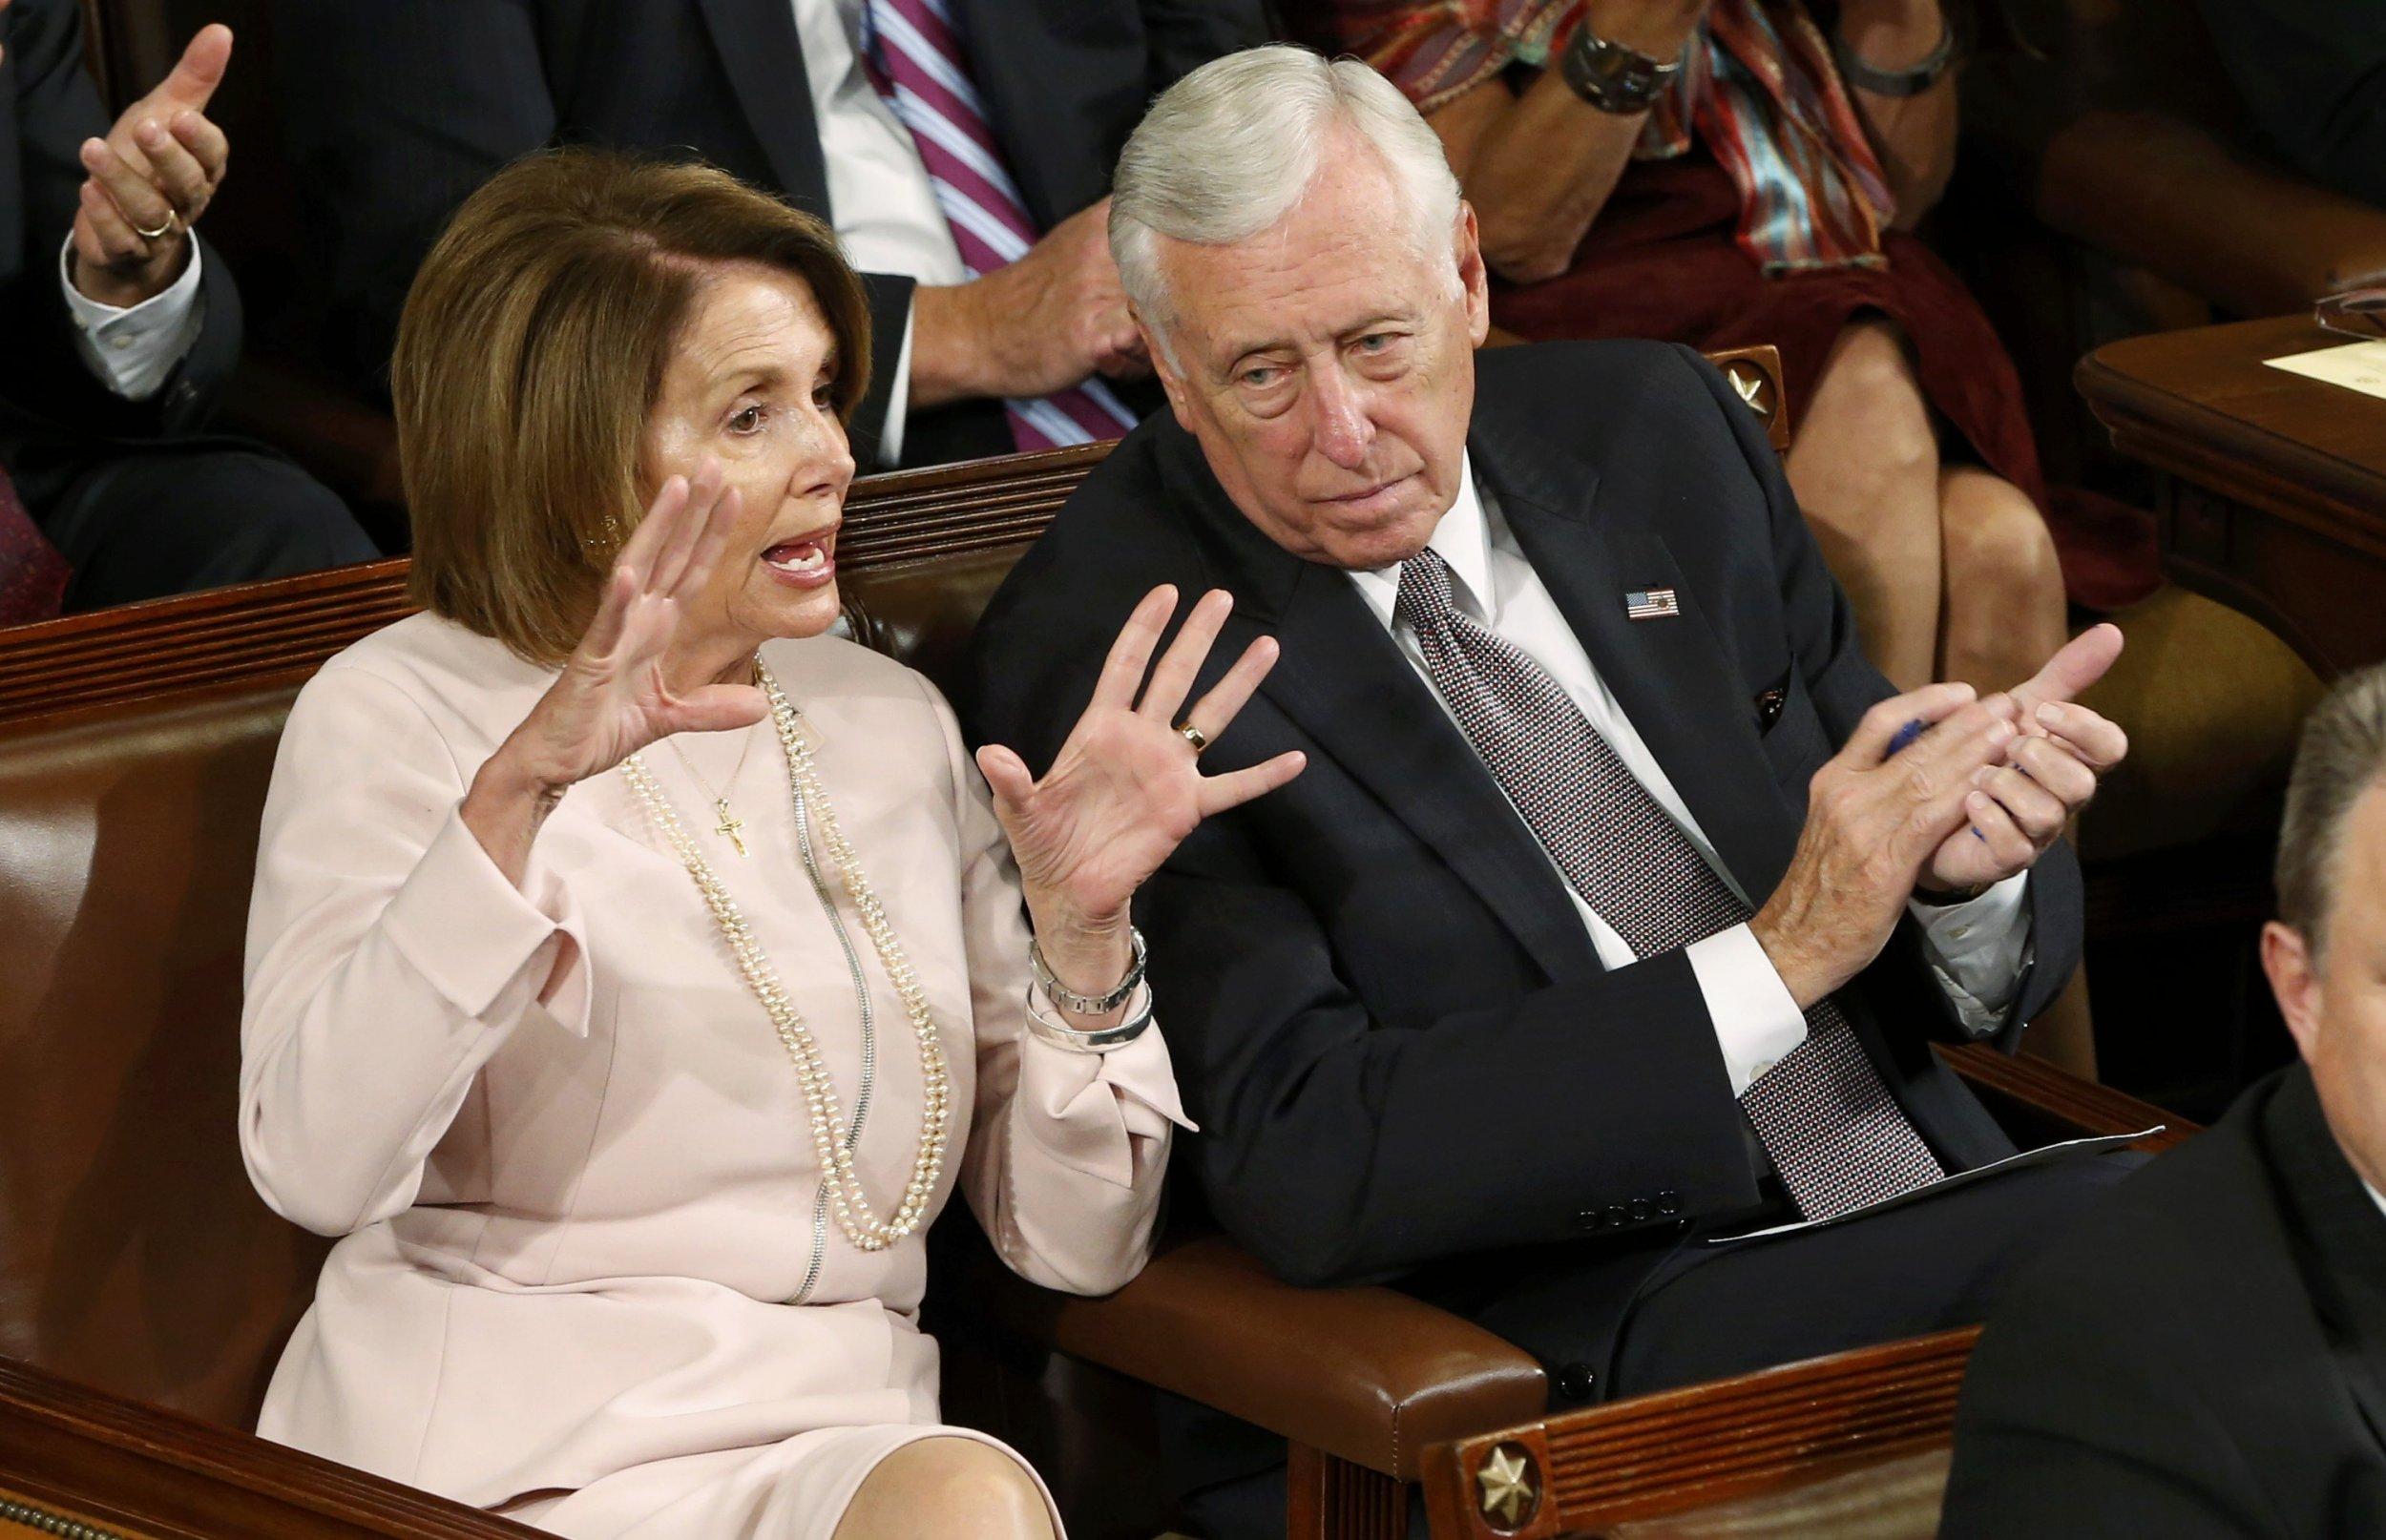 09_24_Pope-Congress_Pelosi-Hoyer_10